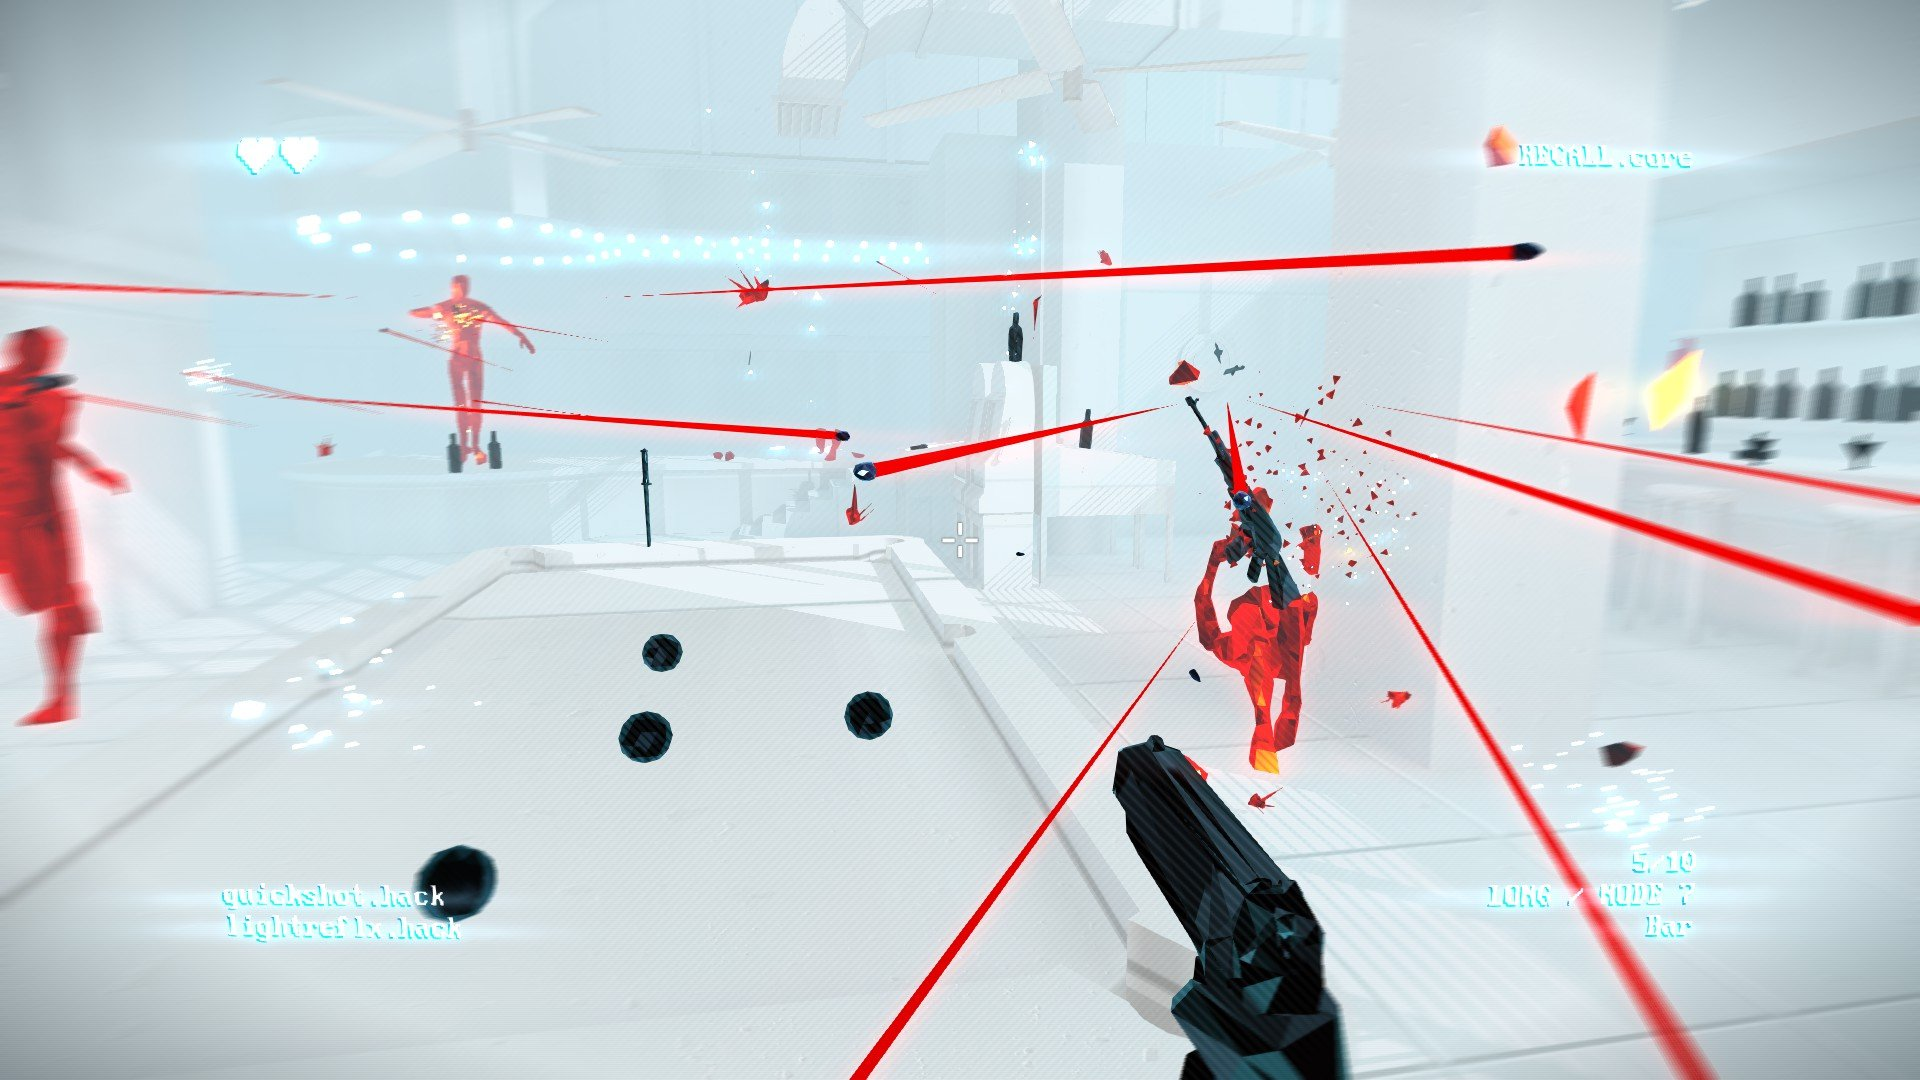 Superhot review on Destructoid